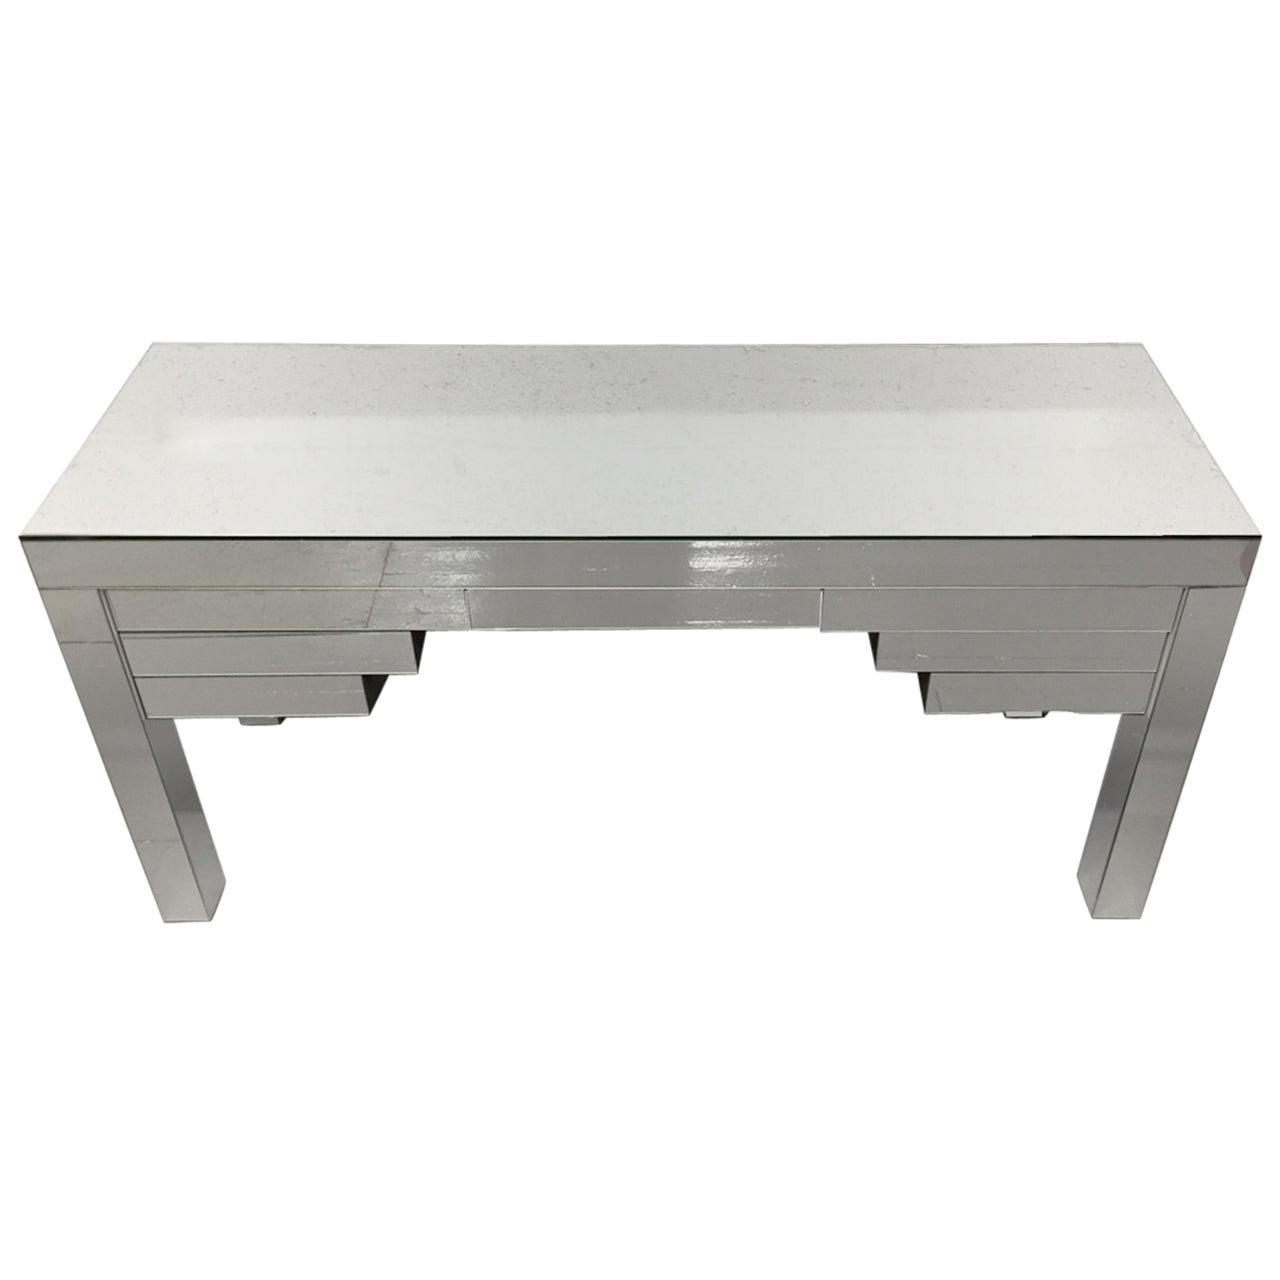 Custom Clad Mirrored Desk, Custom Design